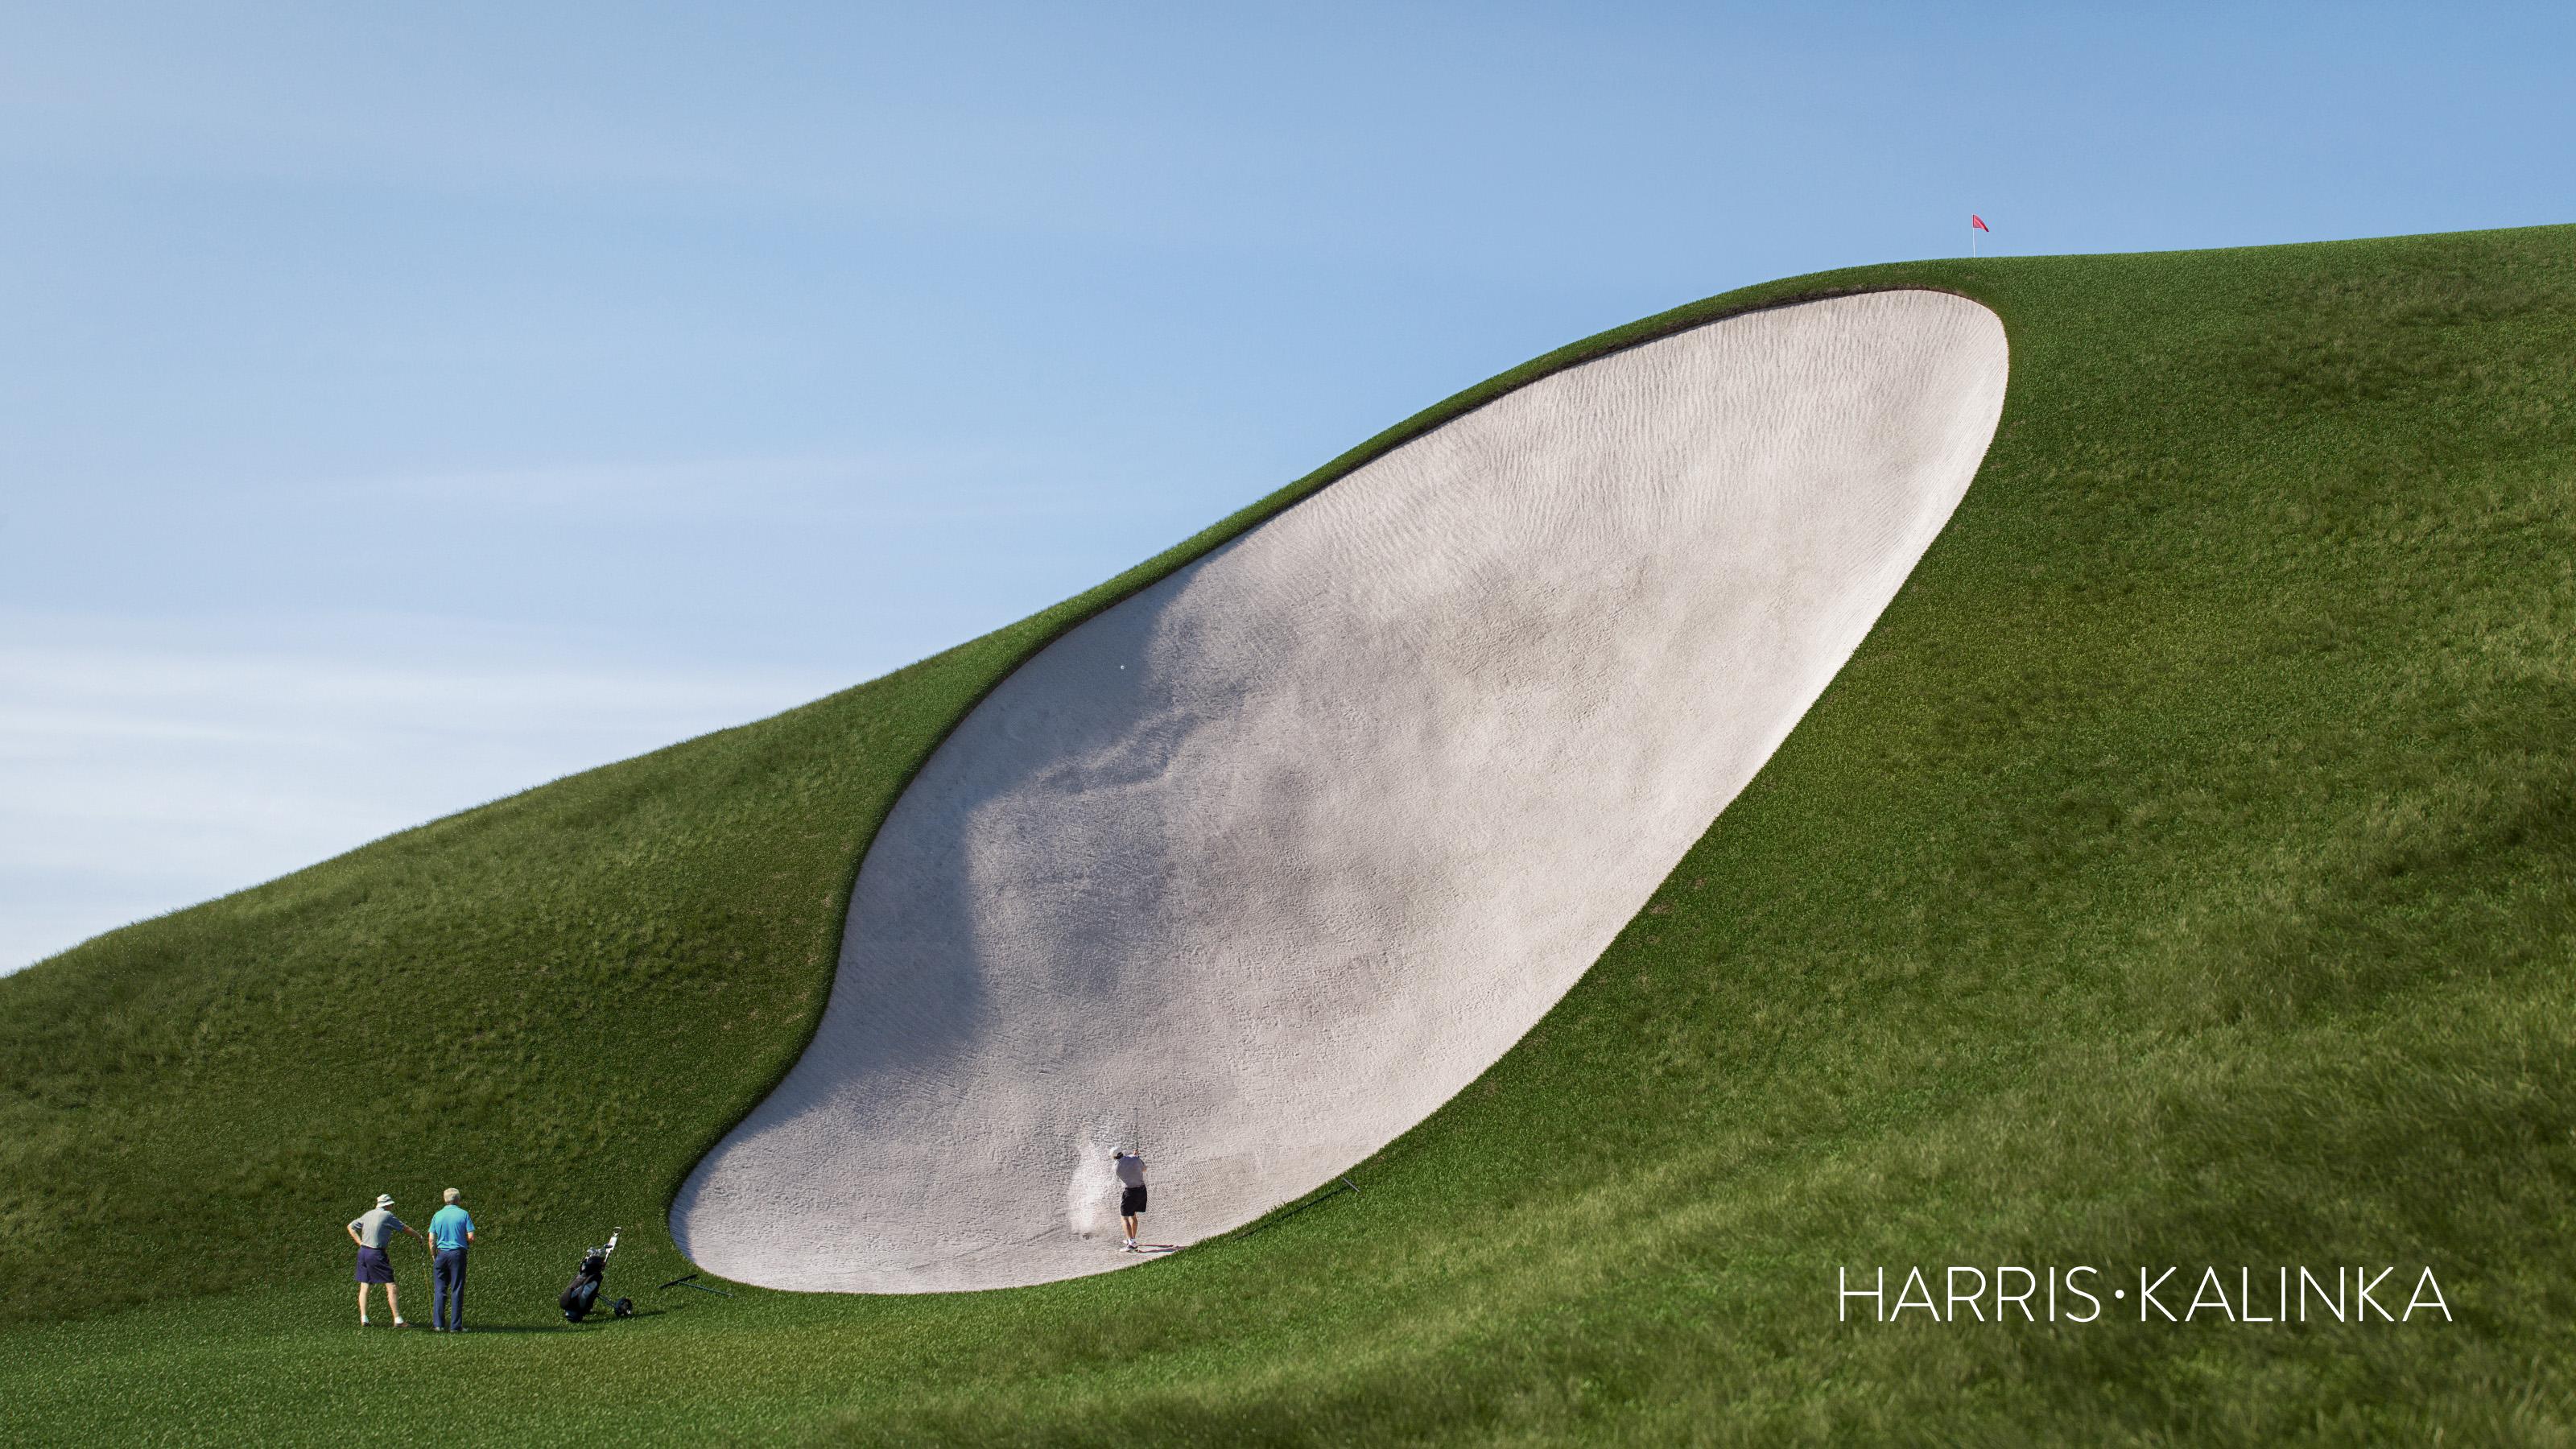 World S Deepest Golf Bunker At New Krisirk Resort Course